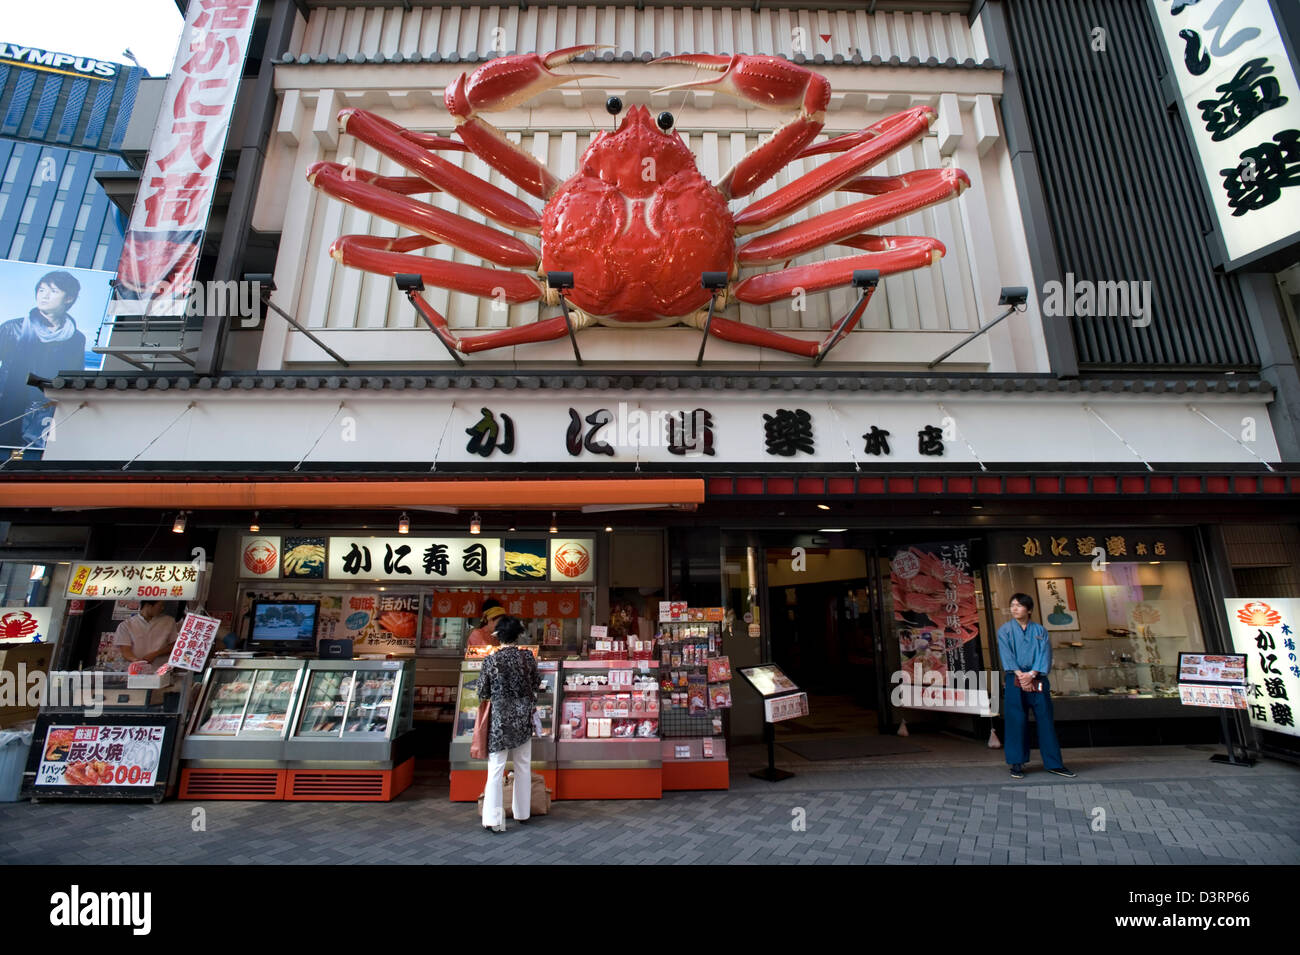 Main shop and restaurant of Kansai favorite, Kanidoraku in Osaka's Dotonbori district, with famous giant mechanical - Stock Image